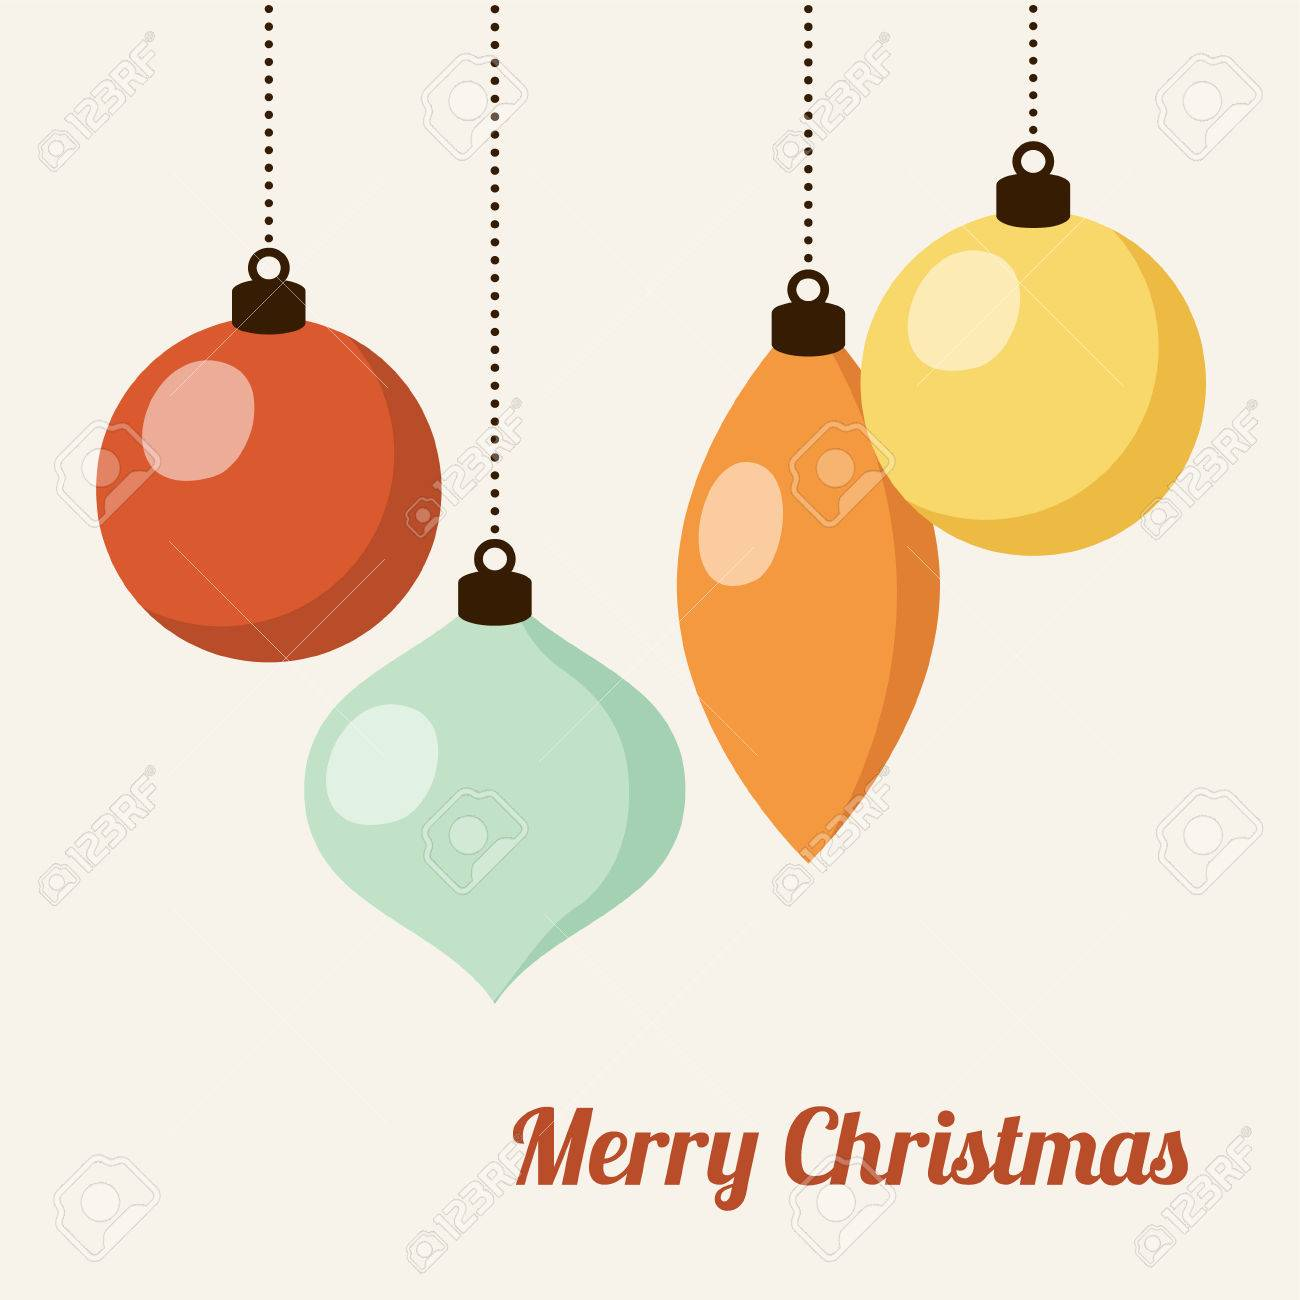 Retro Christmas Card With Christmas Balls, Vector Illustration ...